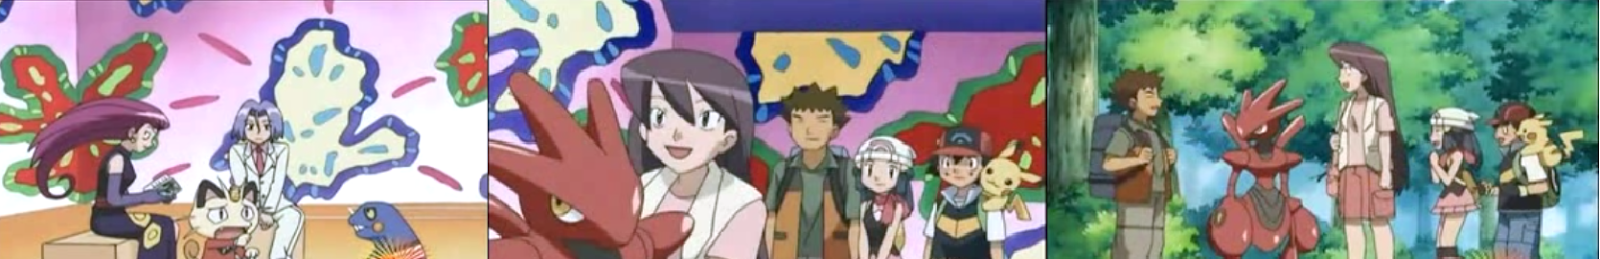 Pokemon Capitulo 8 Temporada 10 Los Farsantes